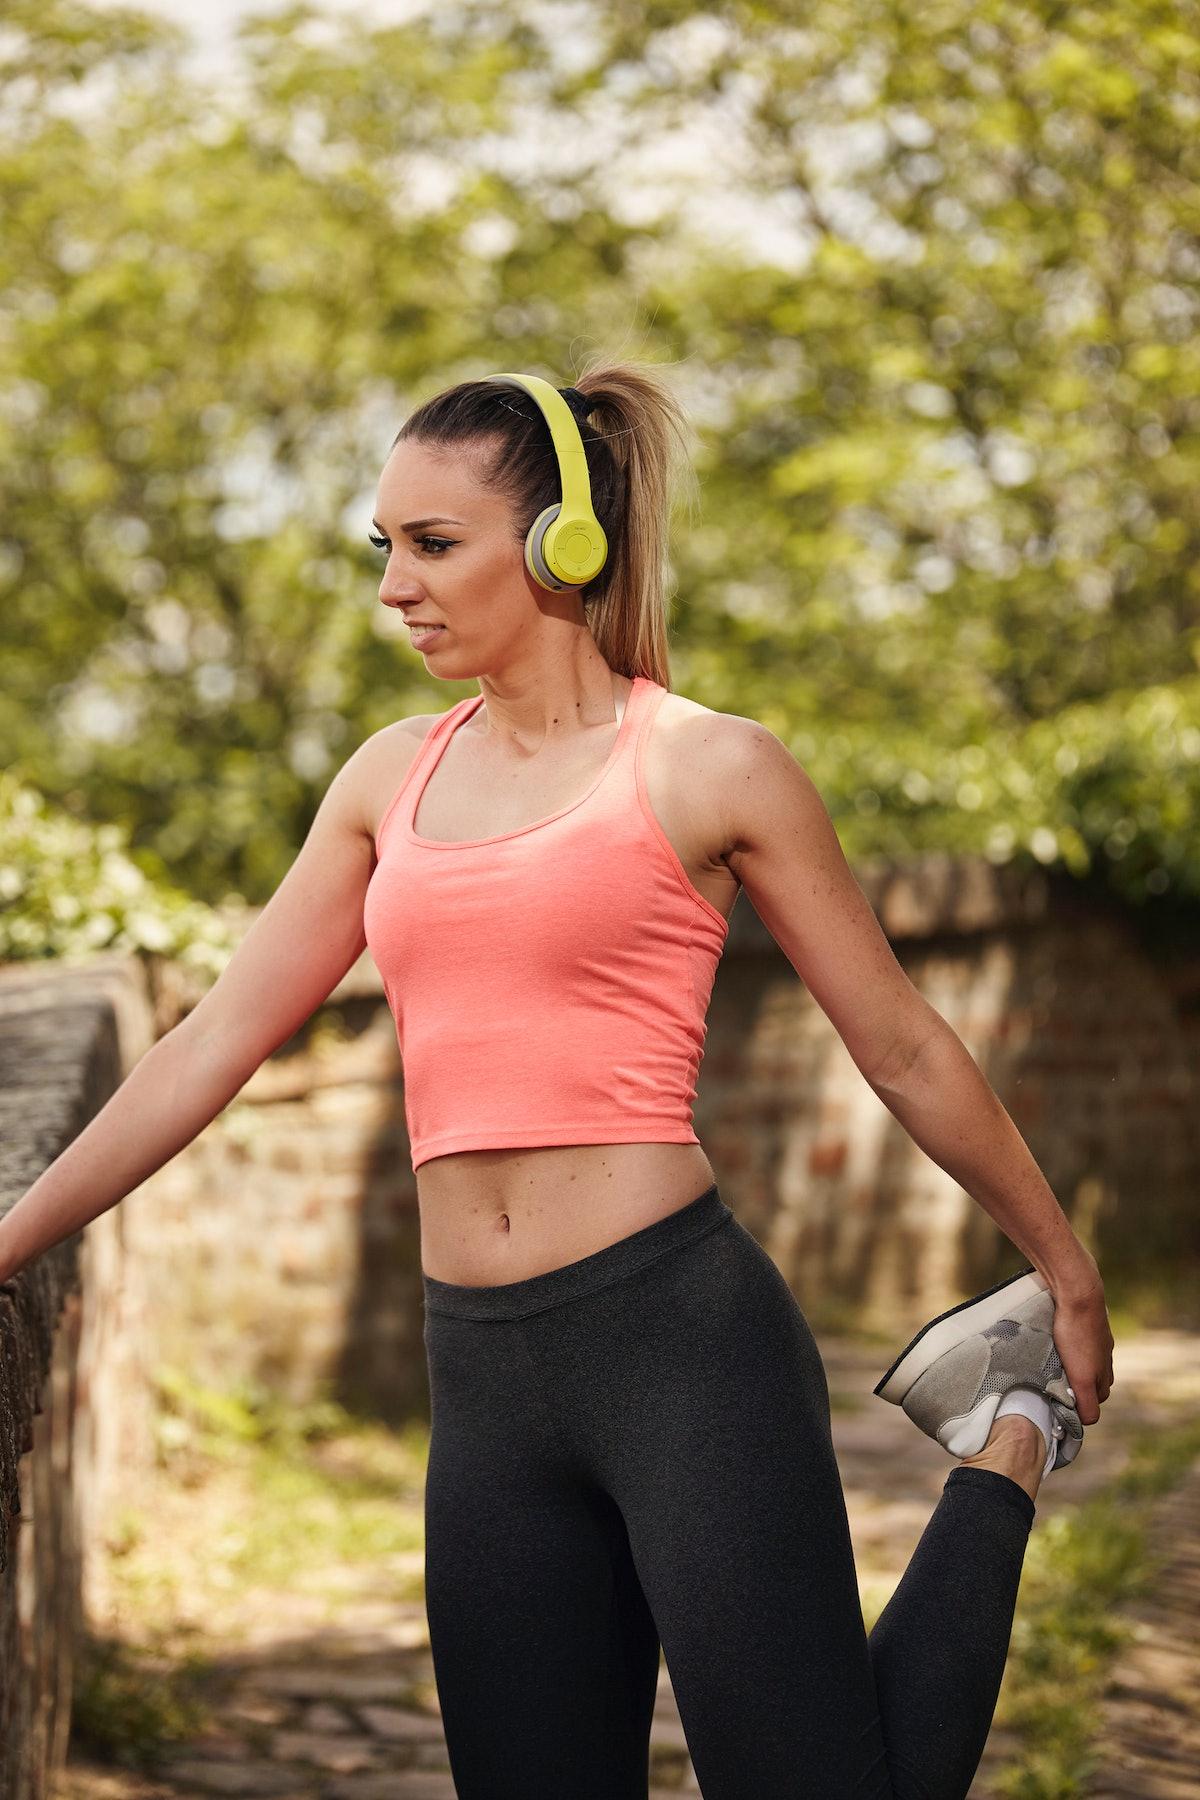 Walking has a wide range of health benefits.